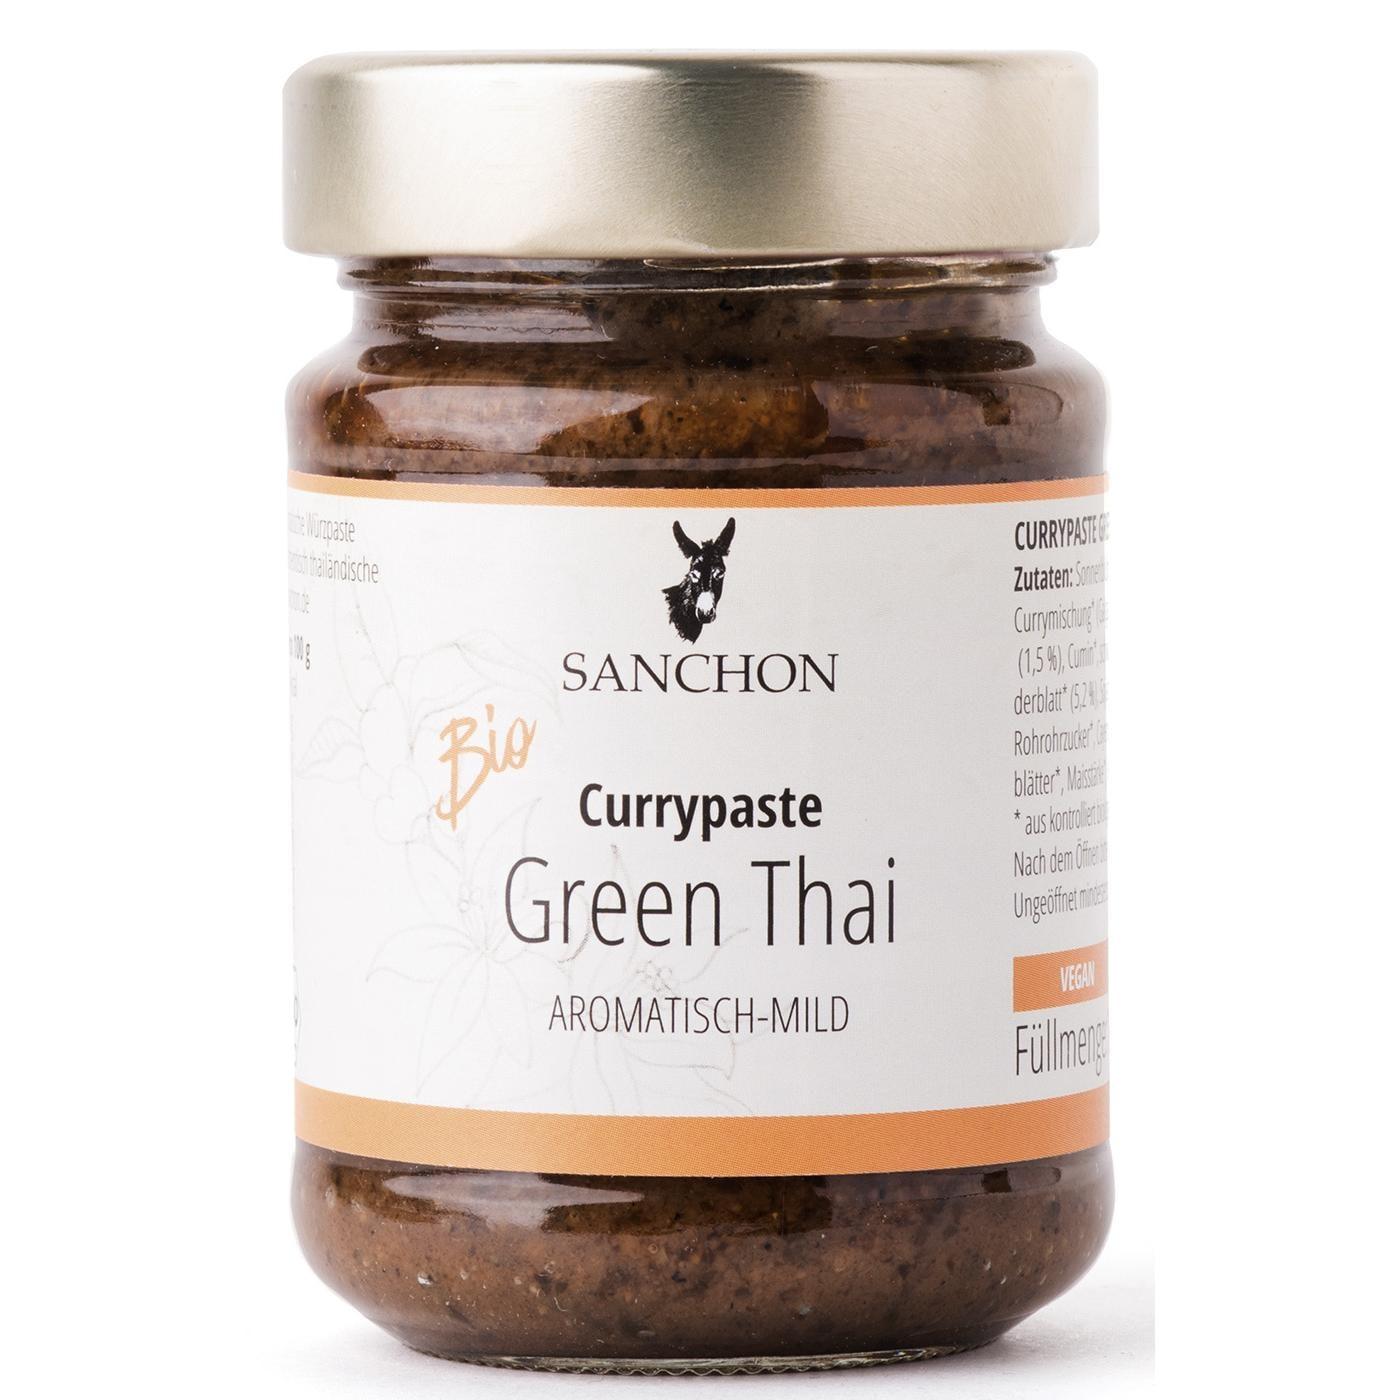 Sanchon Bio Currypaste Green Thai 190g